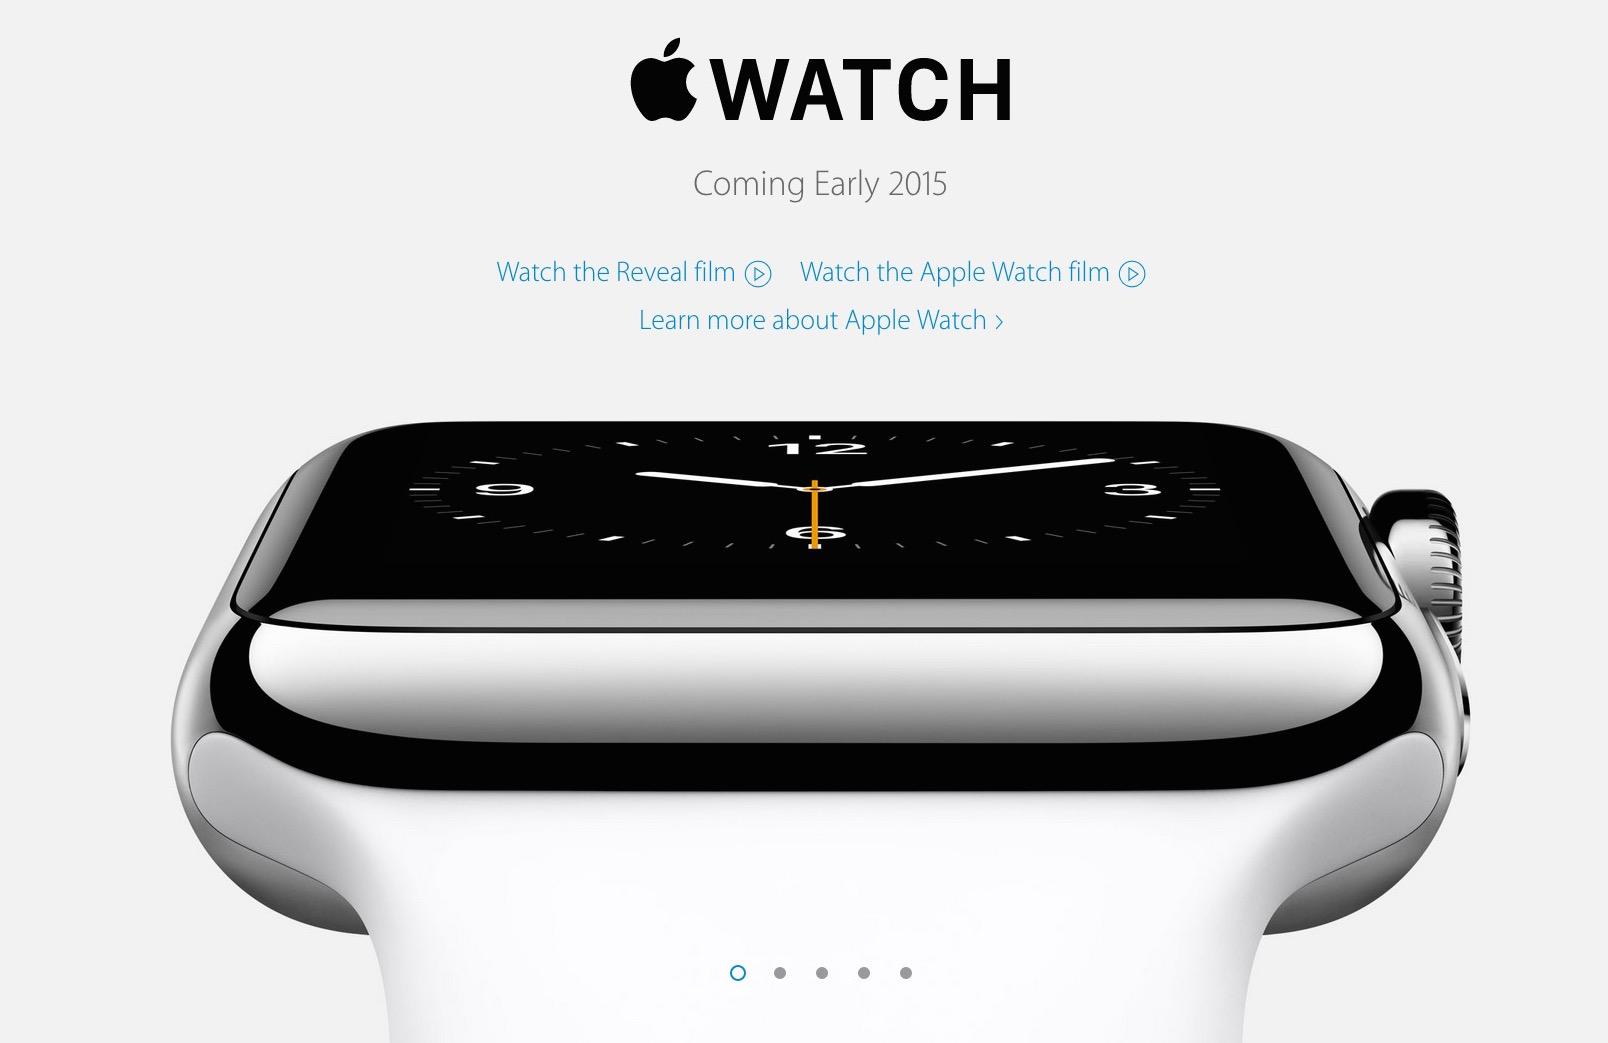 Apple Watchの発売日が「2015年発売」に再度変更される